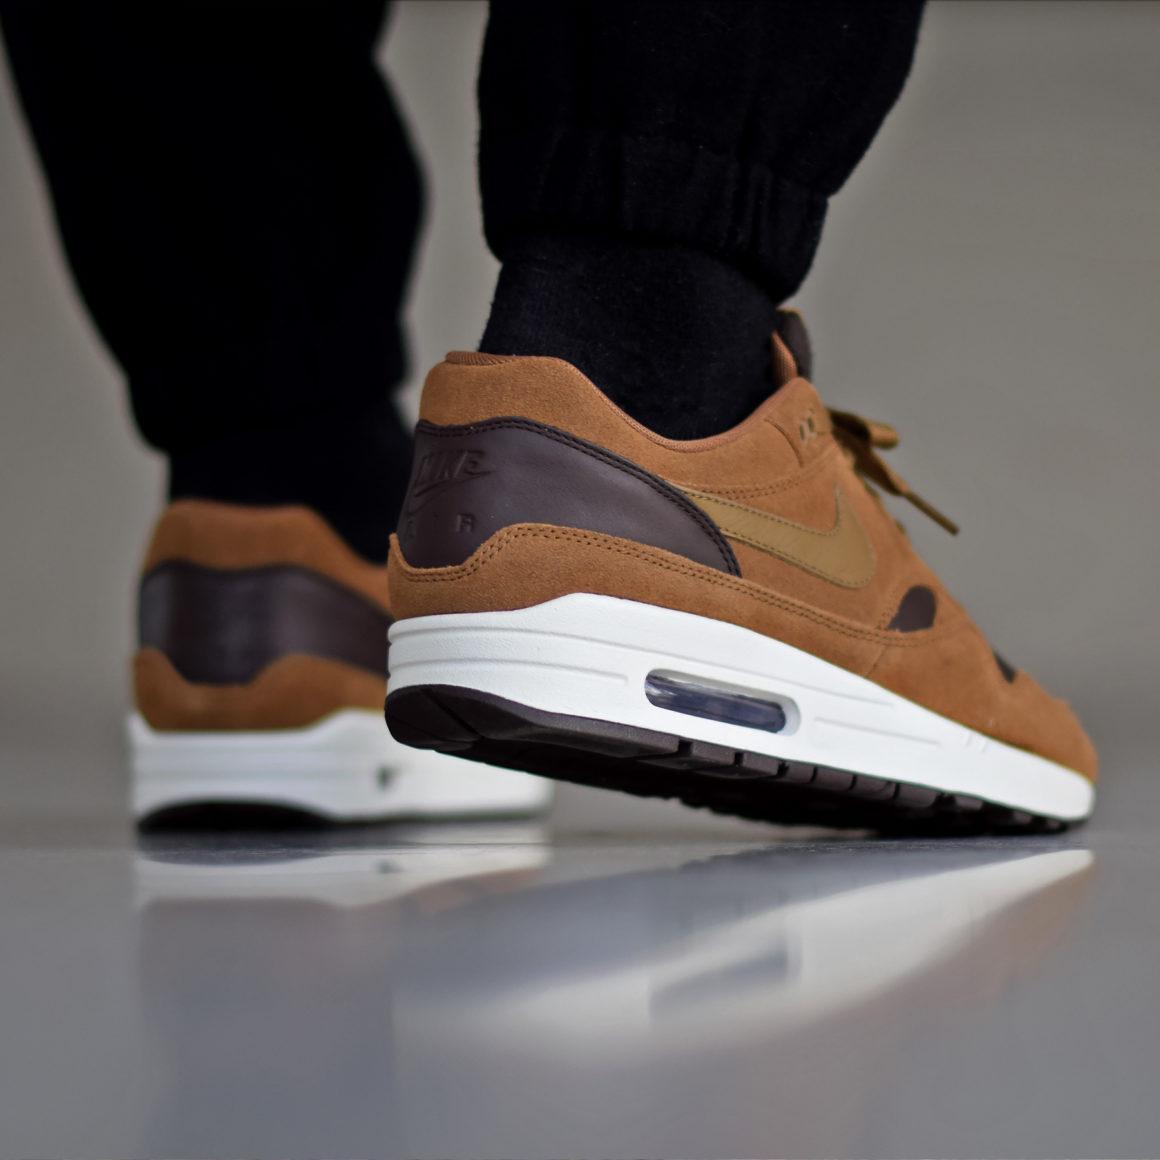 Nike Air Max 1 Premium Leather Ale Brown - Sneakers.fr